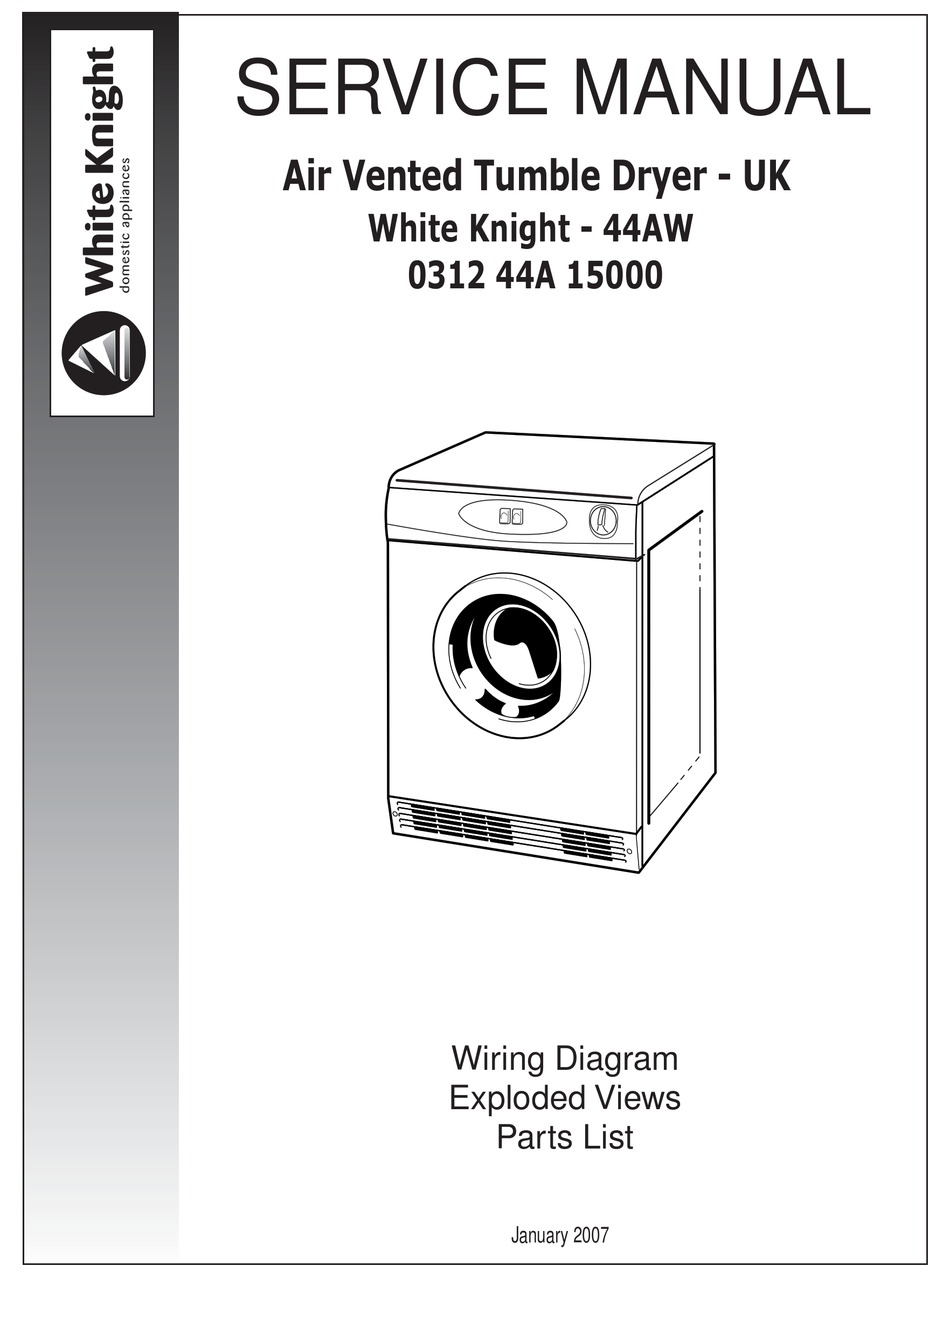 WHITE KNIGHT 44AW SERVICE MANUAL Pdf Download | ManualsLib | White Knight Tumble Dryer Wiring Diagram |  | ManualsLib